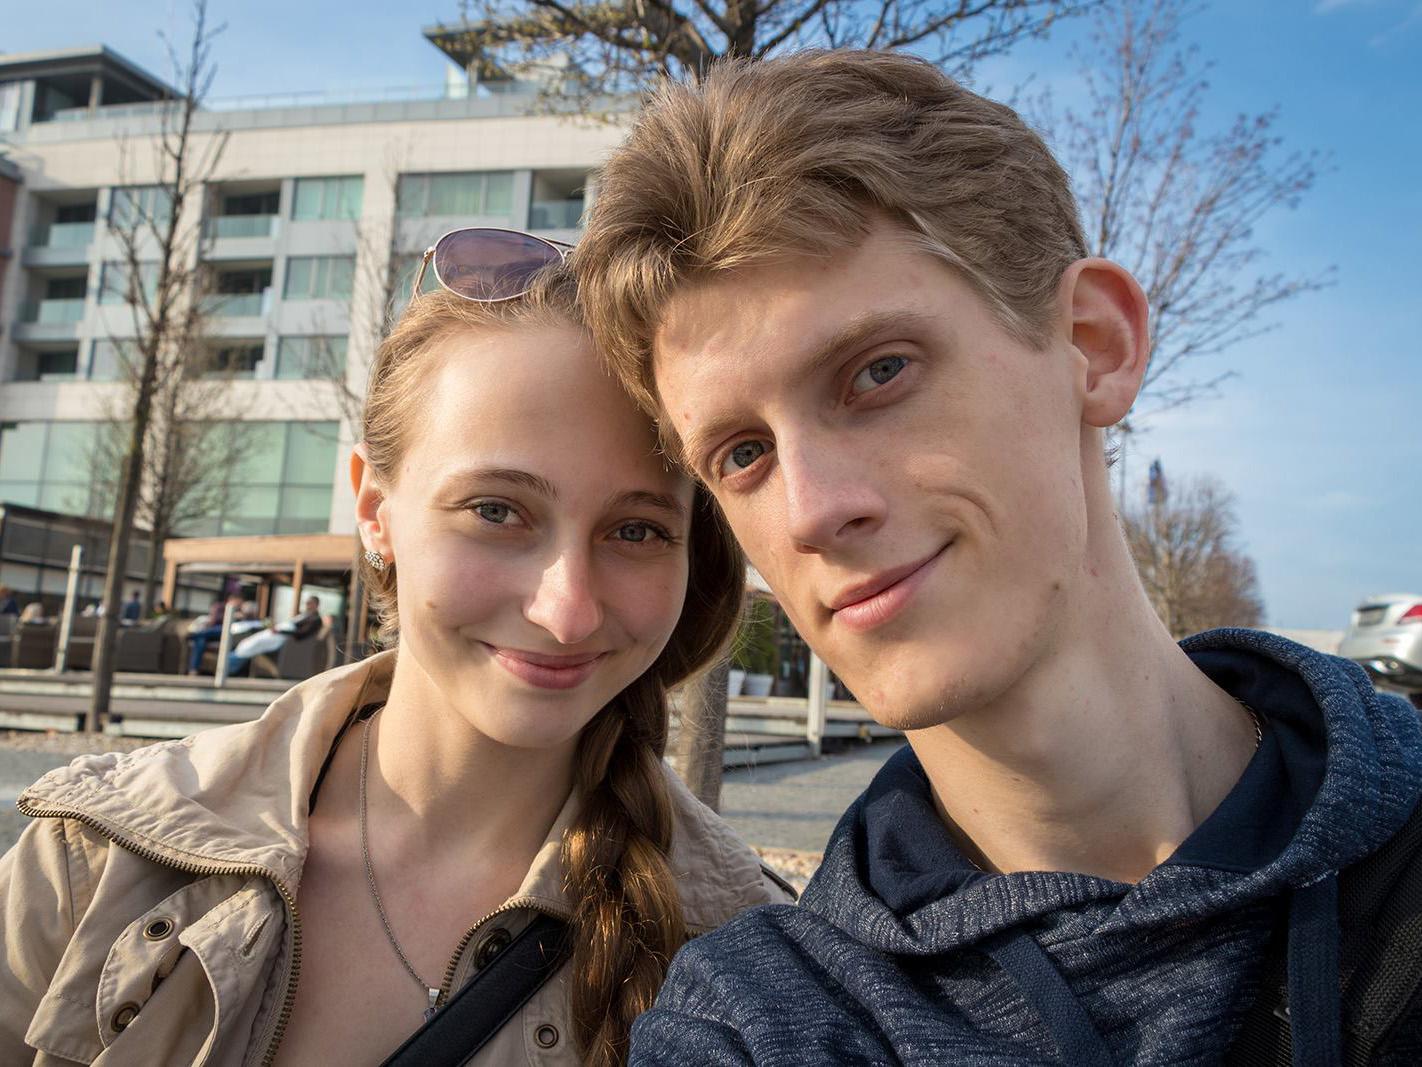 Krisz & Veronika